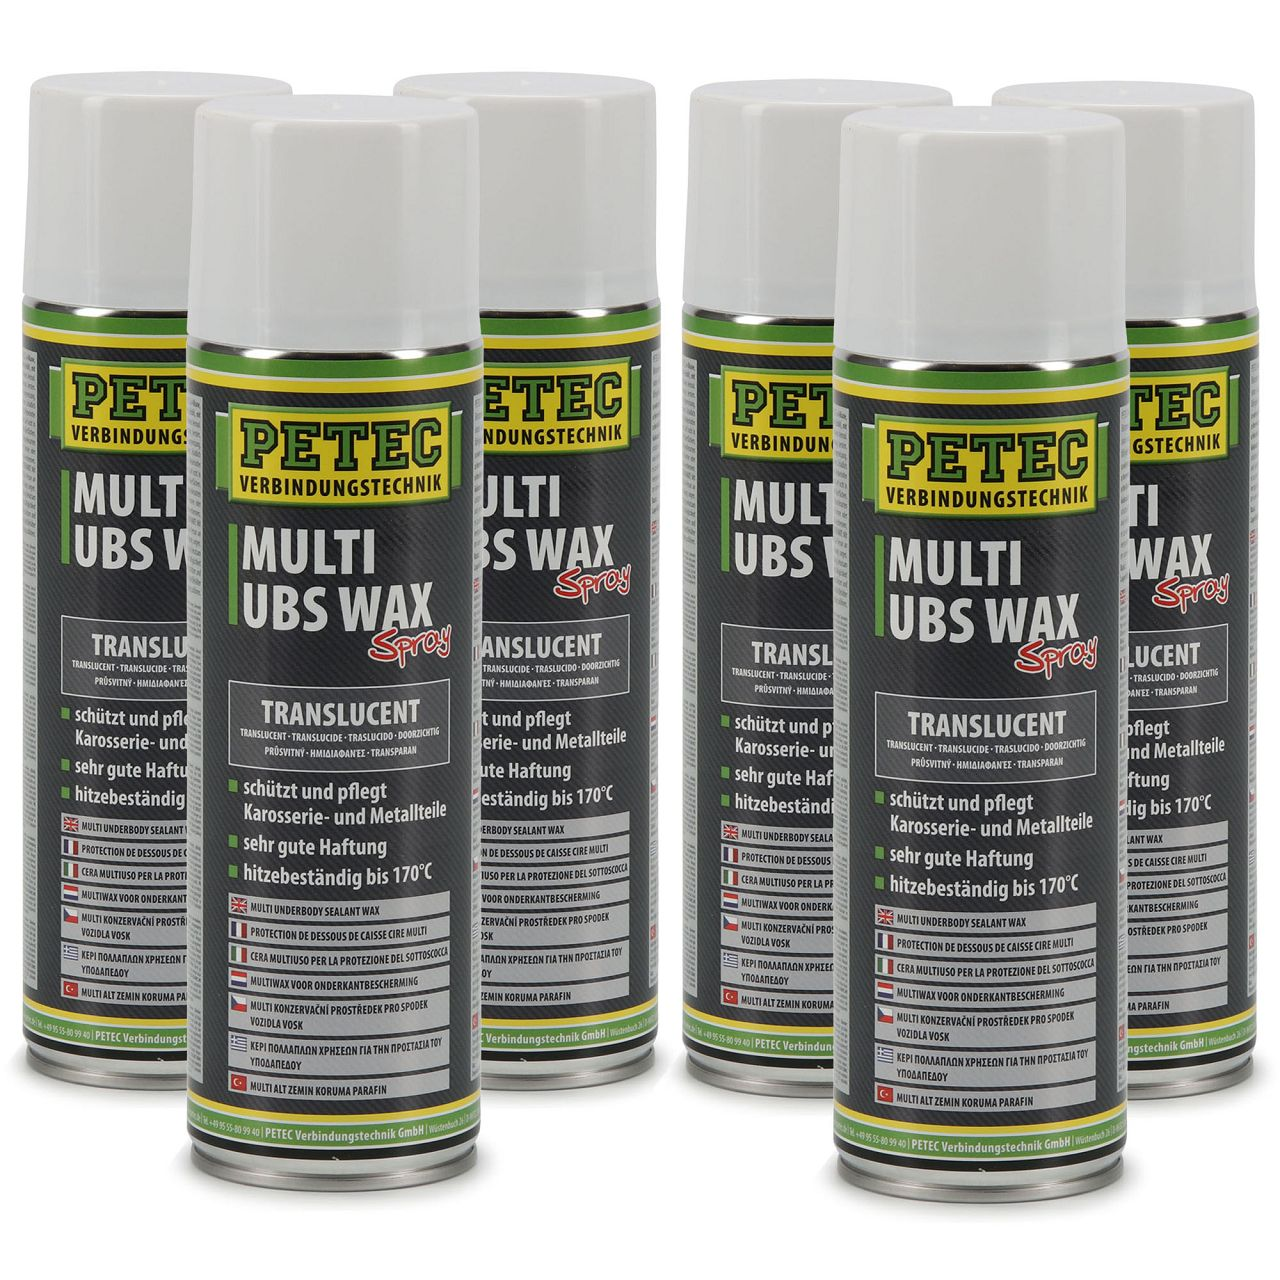 PETEC 73450 MULTI UBS WAX Spray Unterbodenschutz Korrosionsschutz 6x 500ml